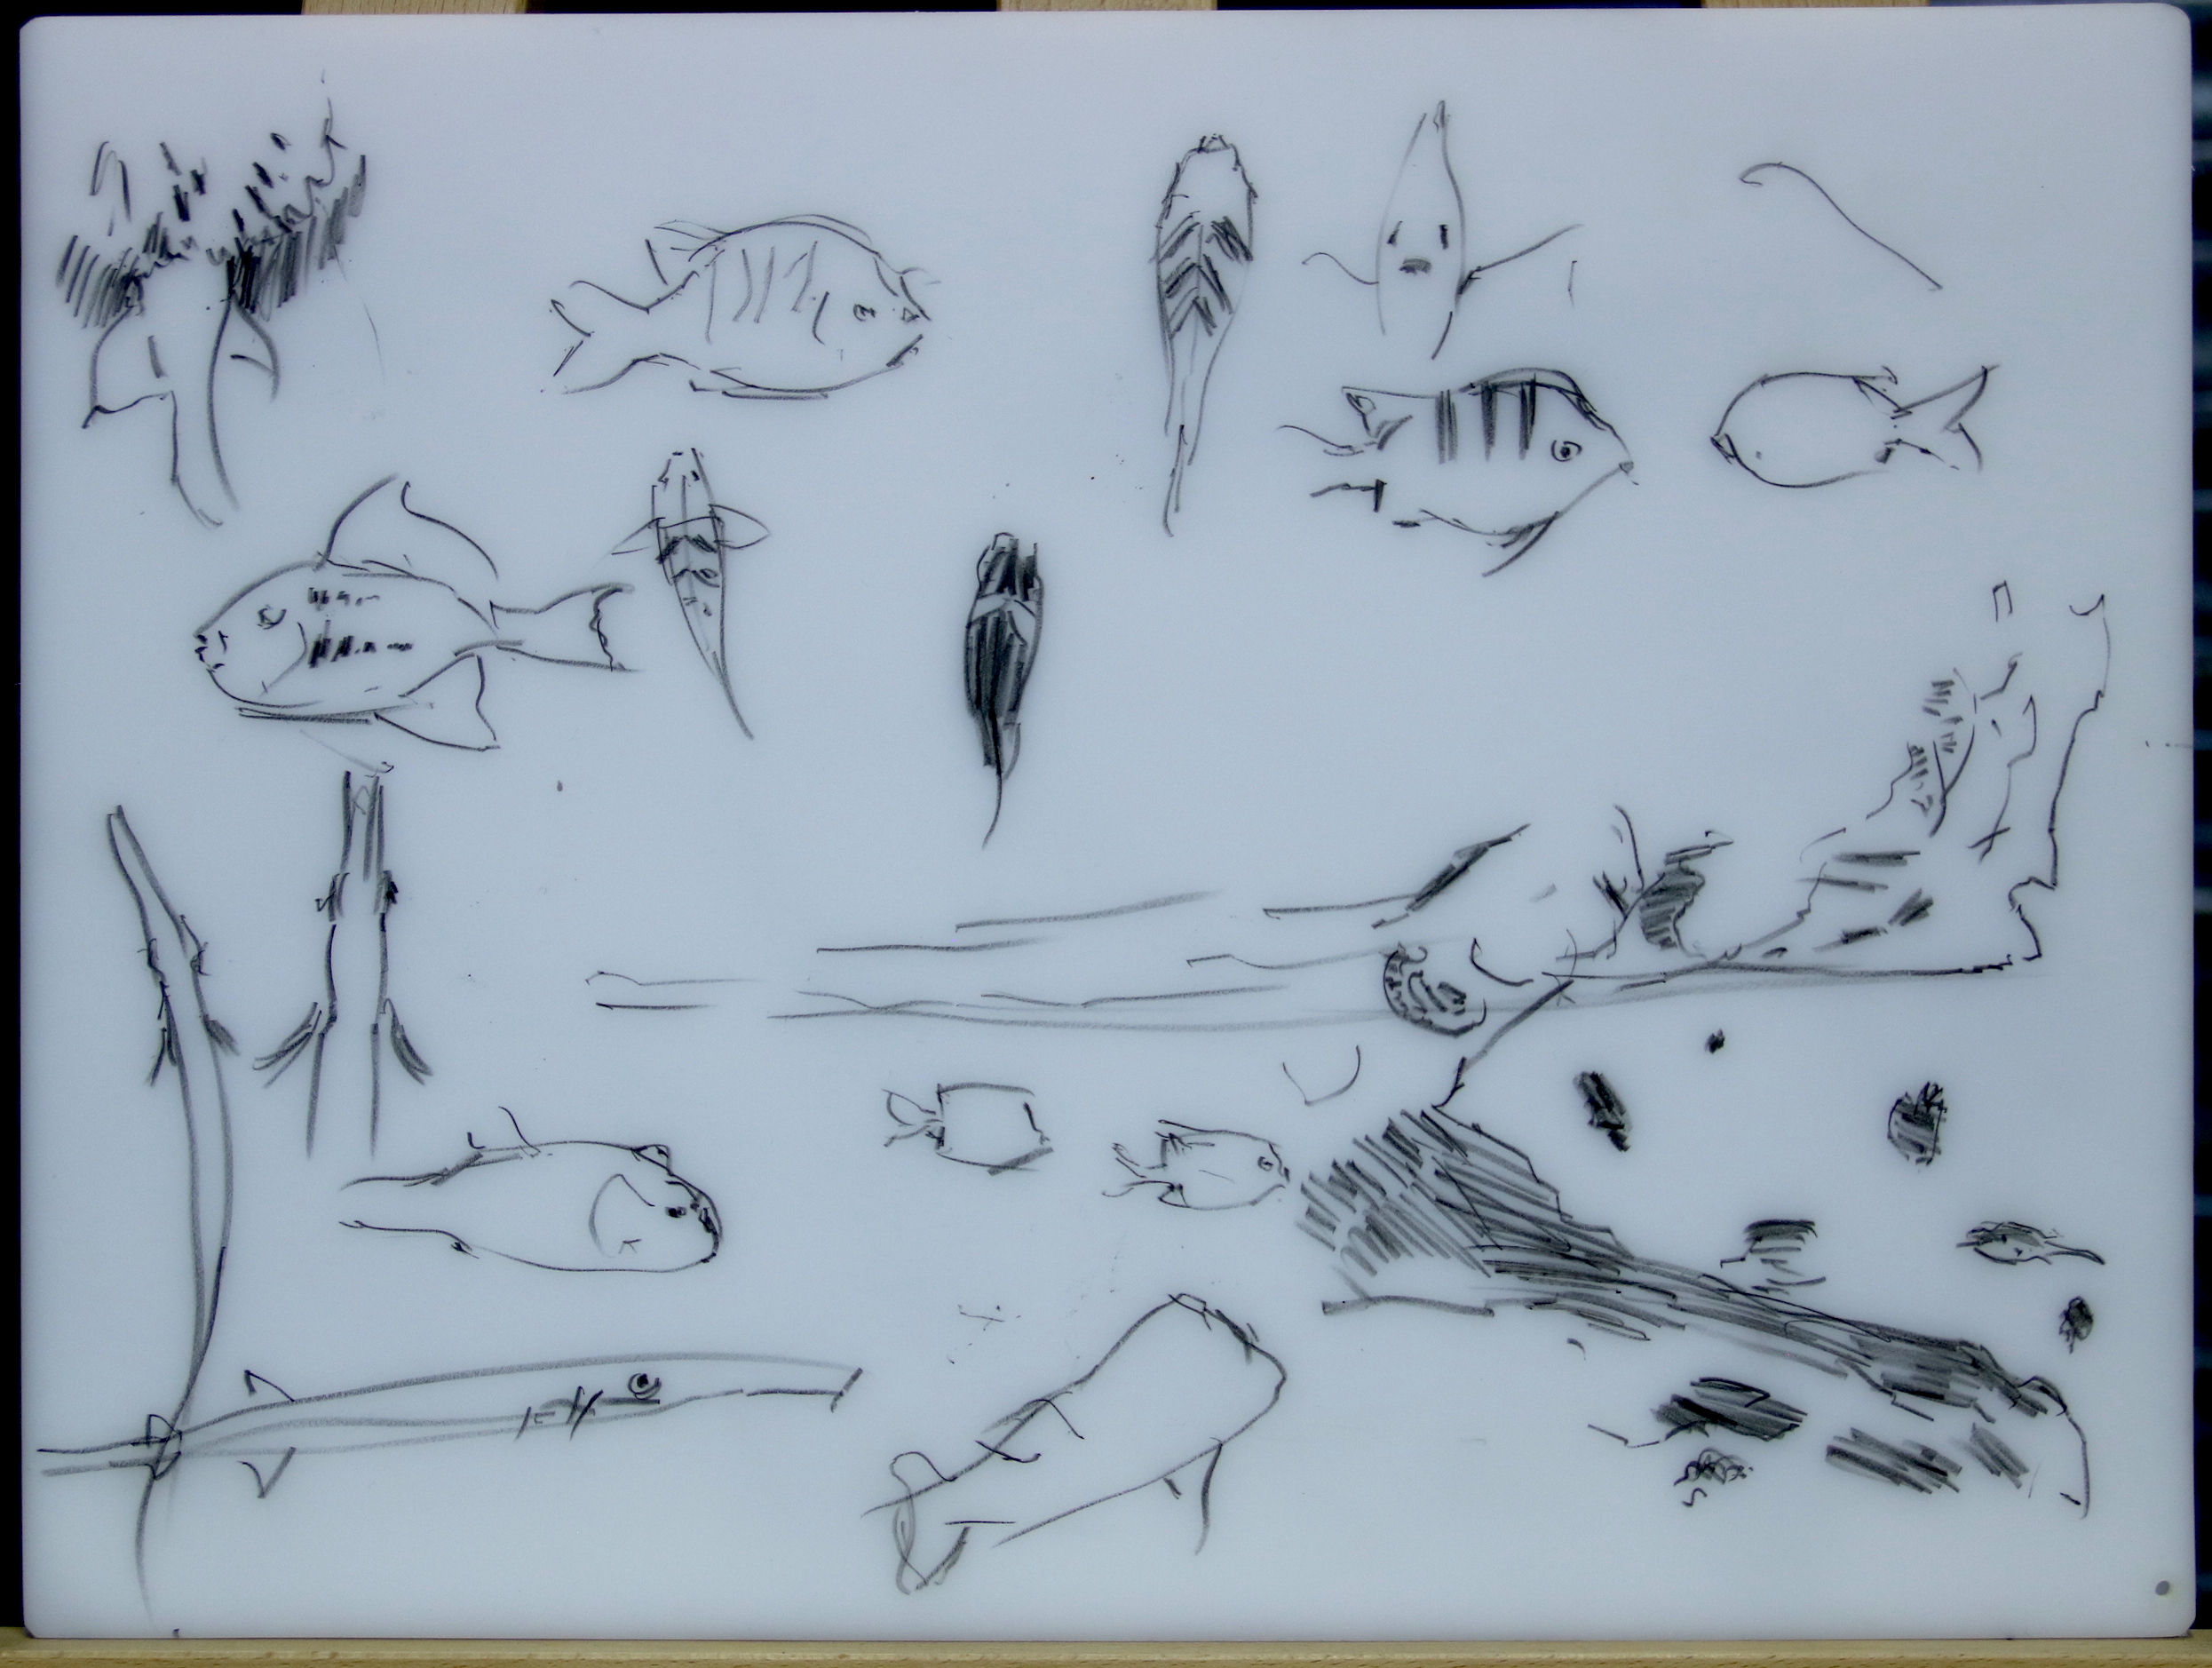 Various reef dwelling fish: Sargent majors, parrot fish, puffer fish, needle fish.